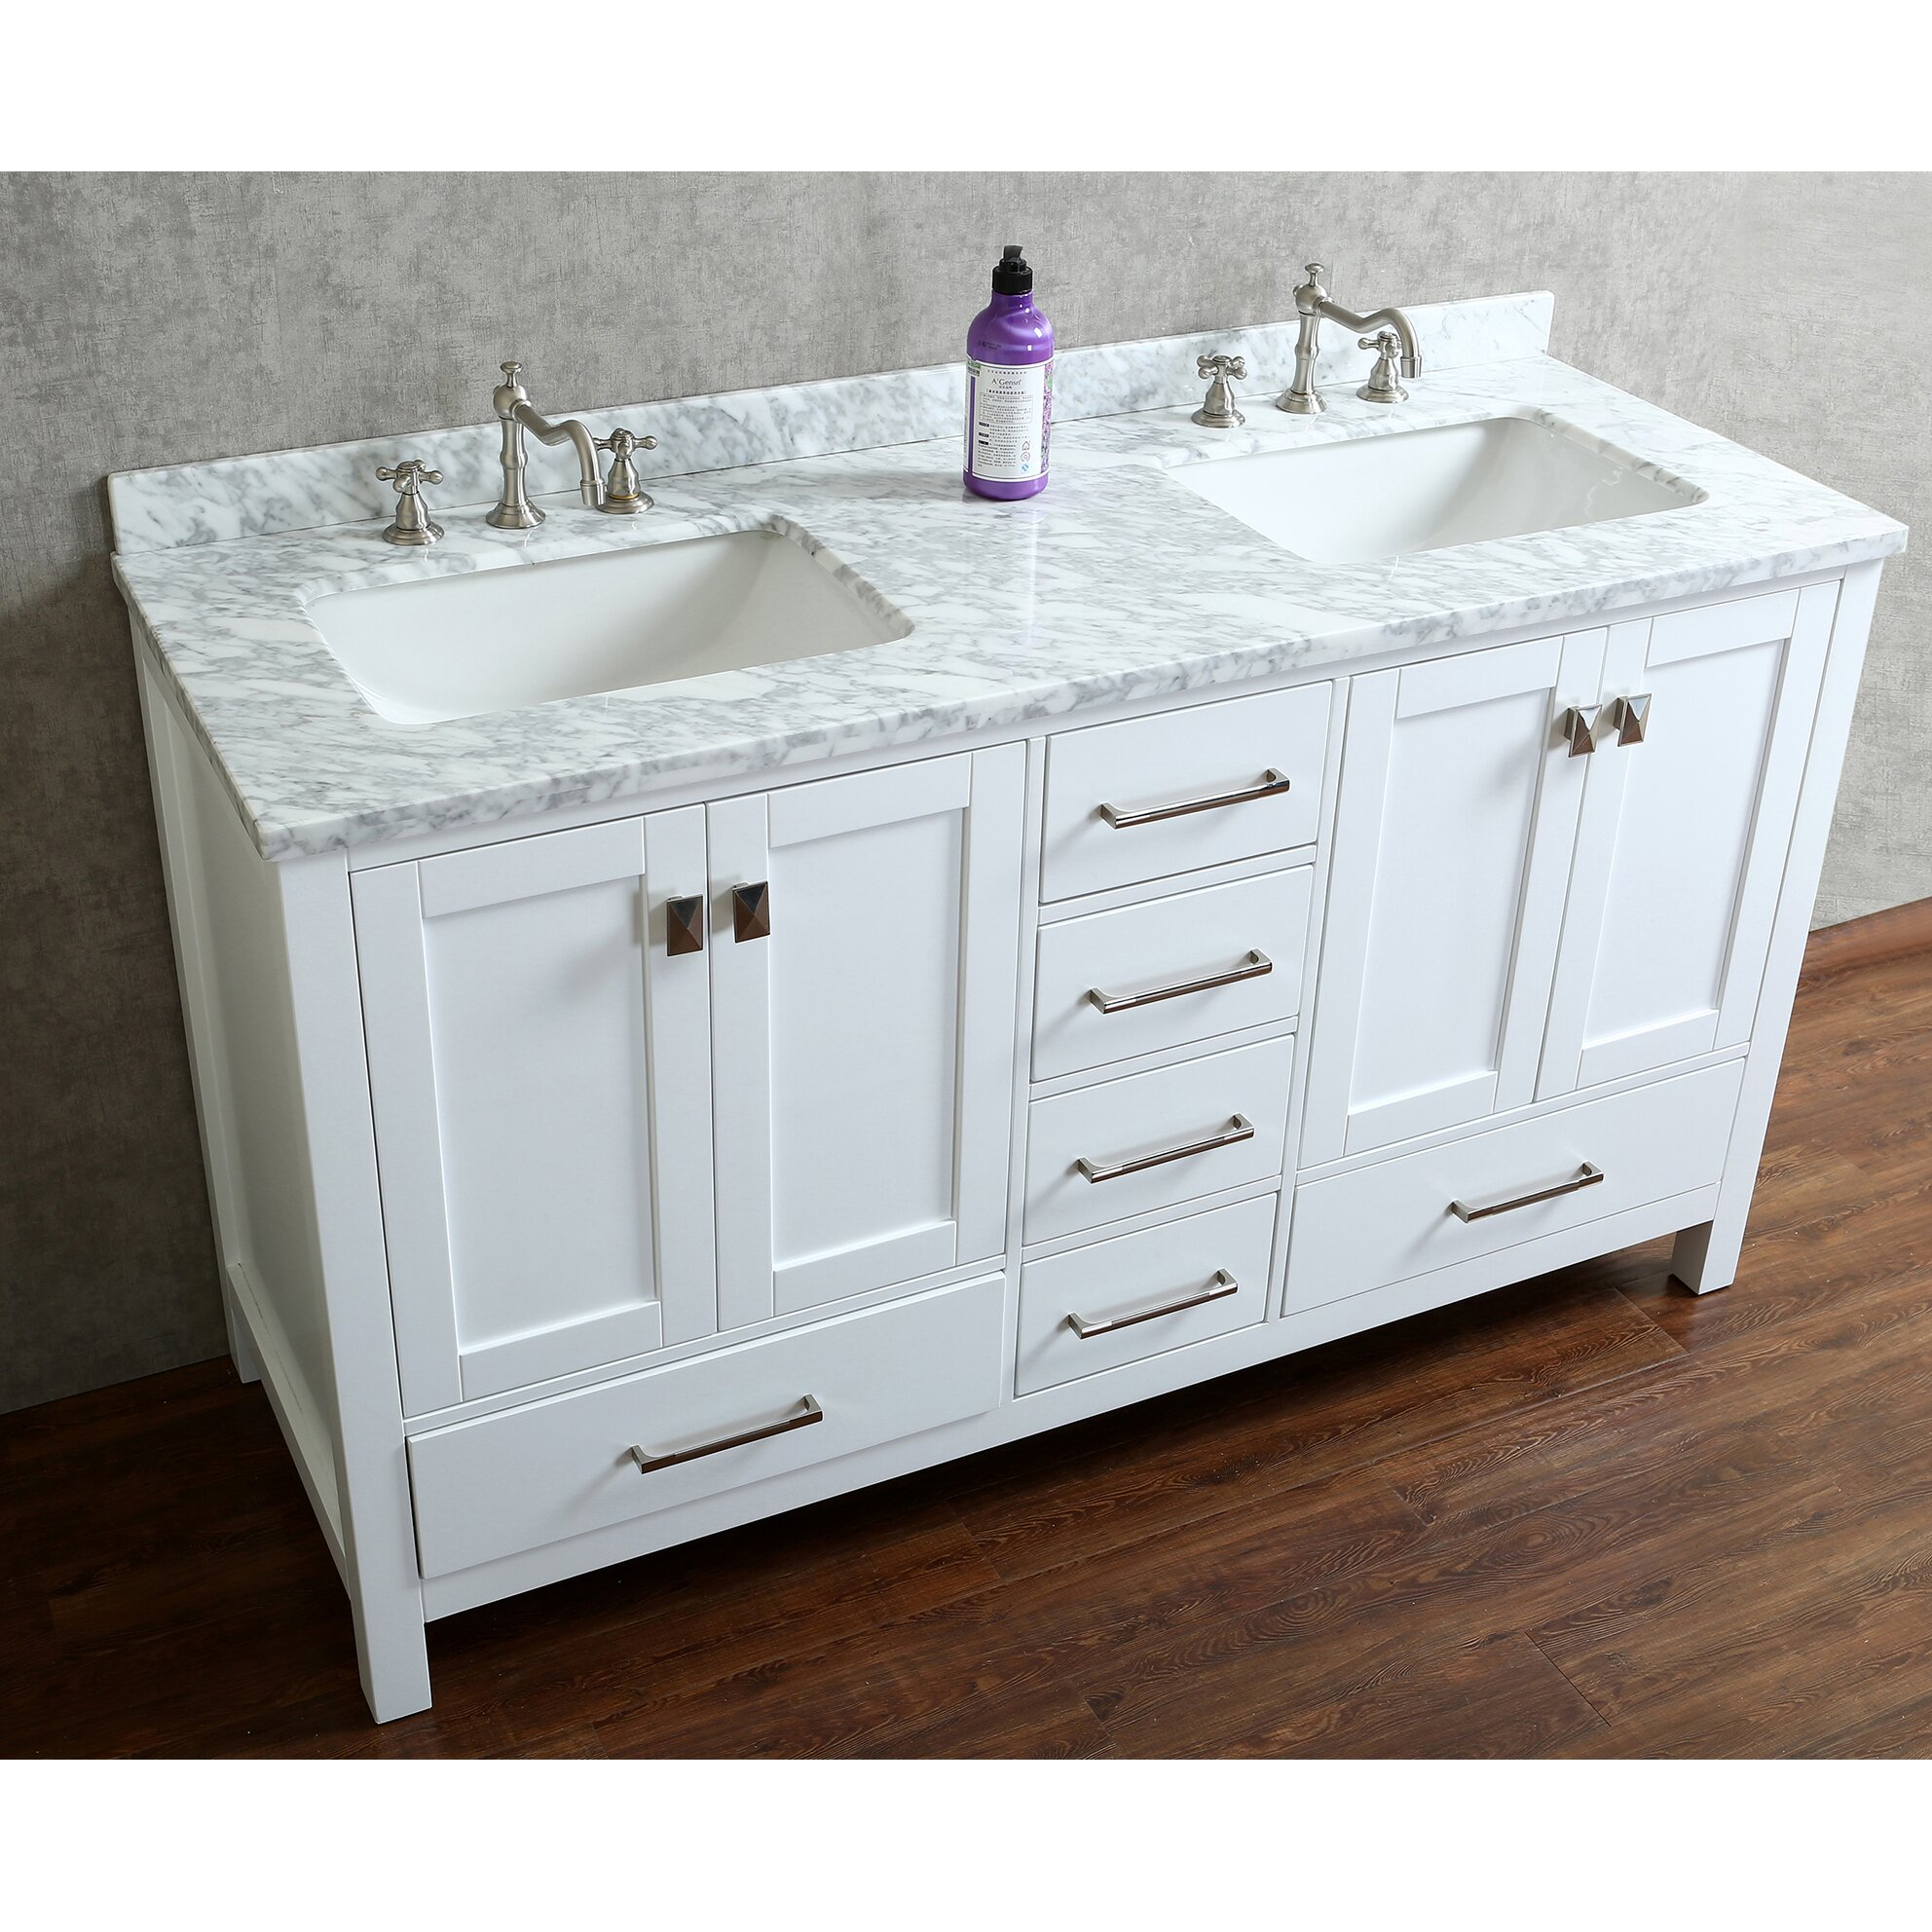 "Ari Kitchen & Bath Bella 60"" Double Bathroom Vanity Set With Mirror & Reviews"